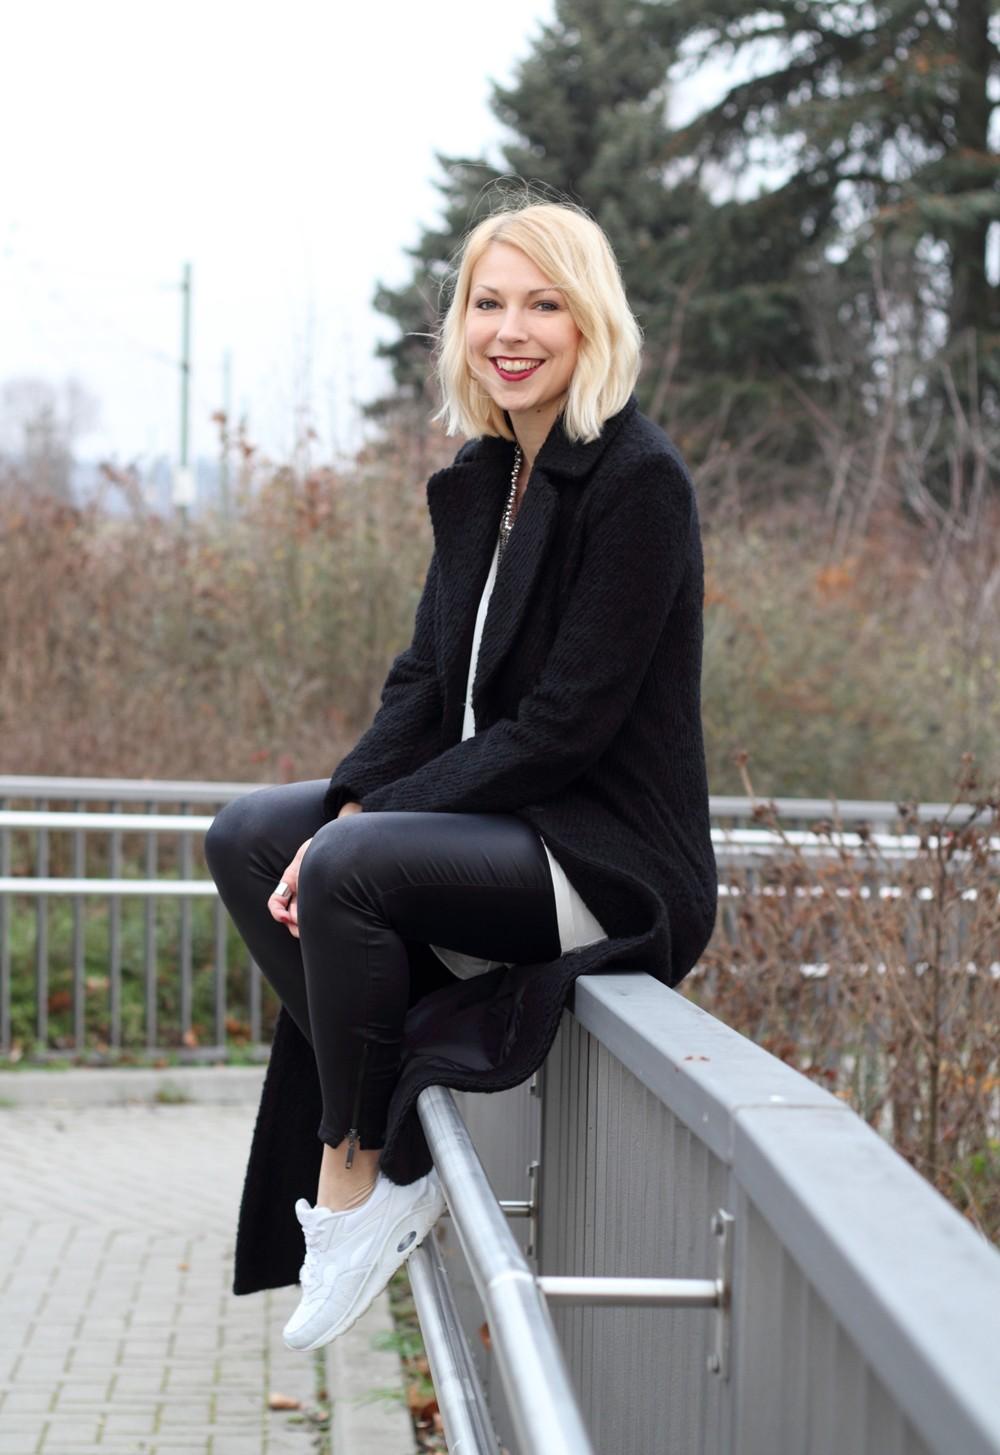 Fashionbloggerin Karlsruhe Outfit Lederhosen Sneaker Sweater langer Mantel 8